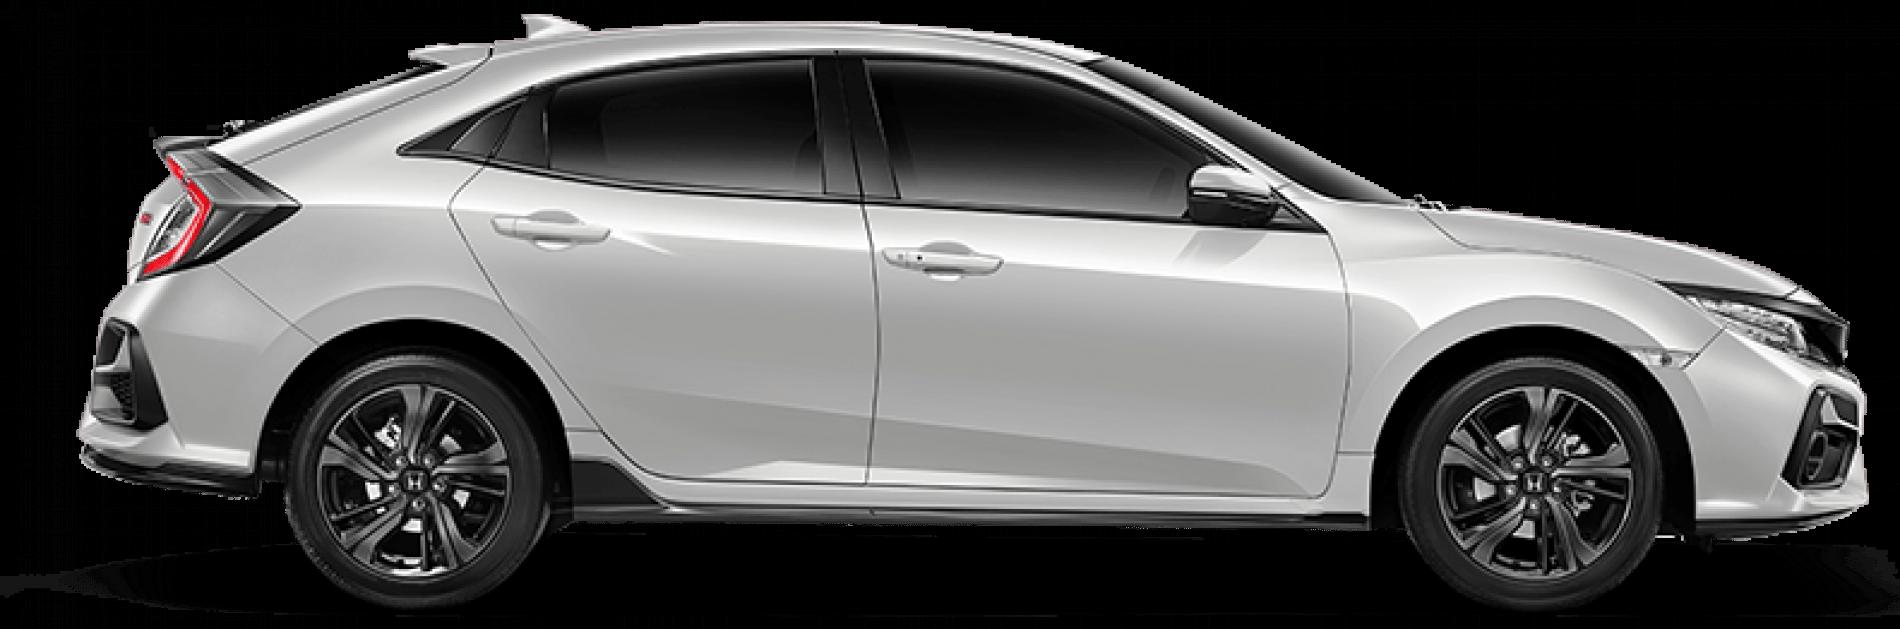 Honda civic turbo bekasi